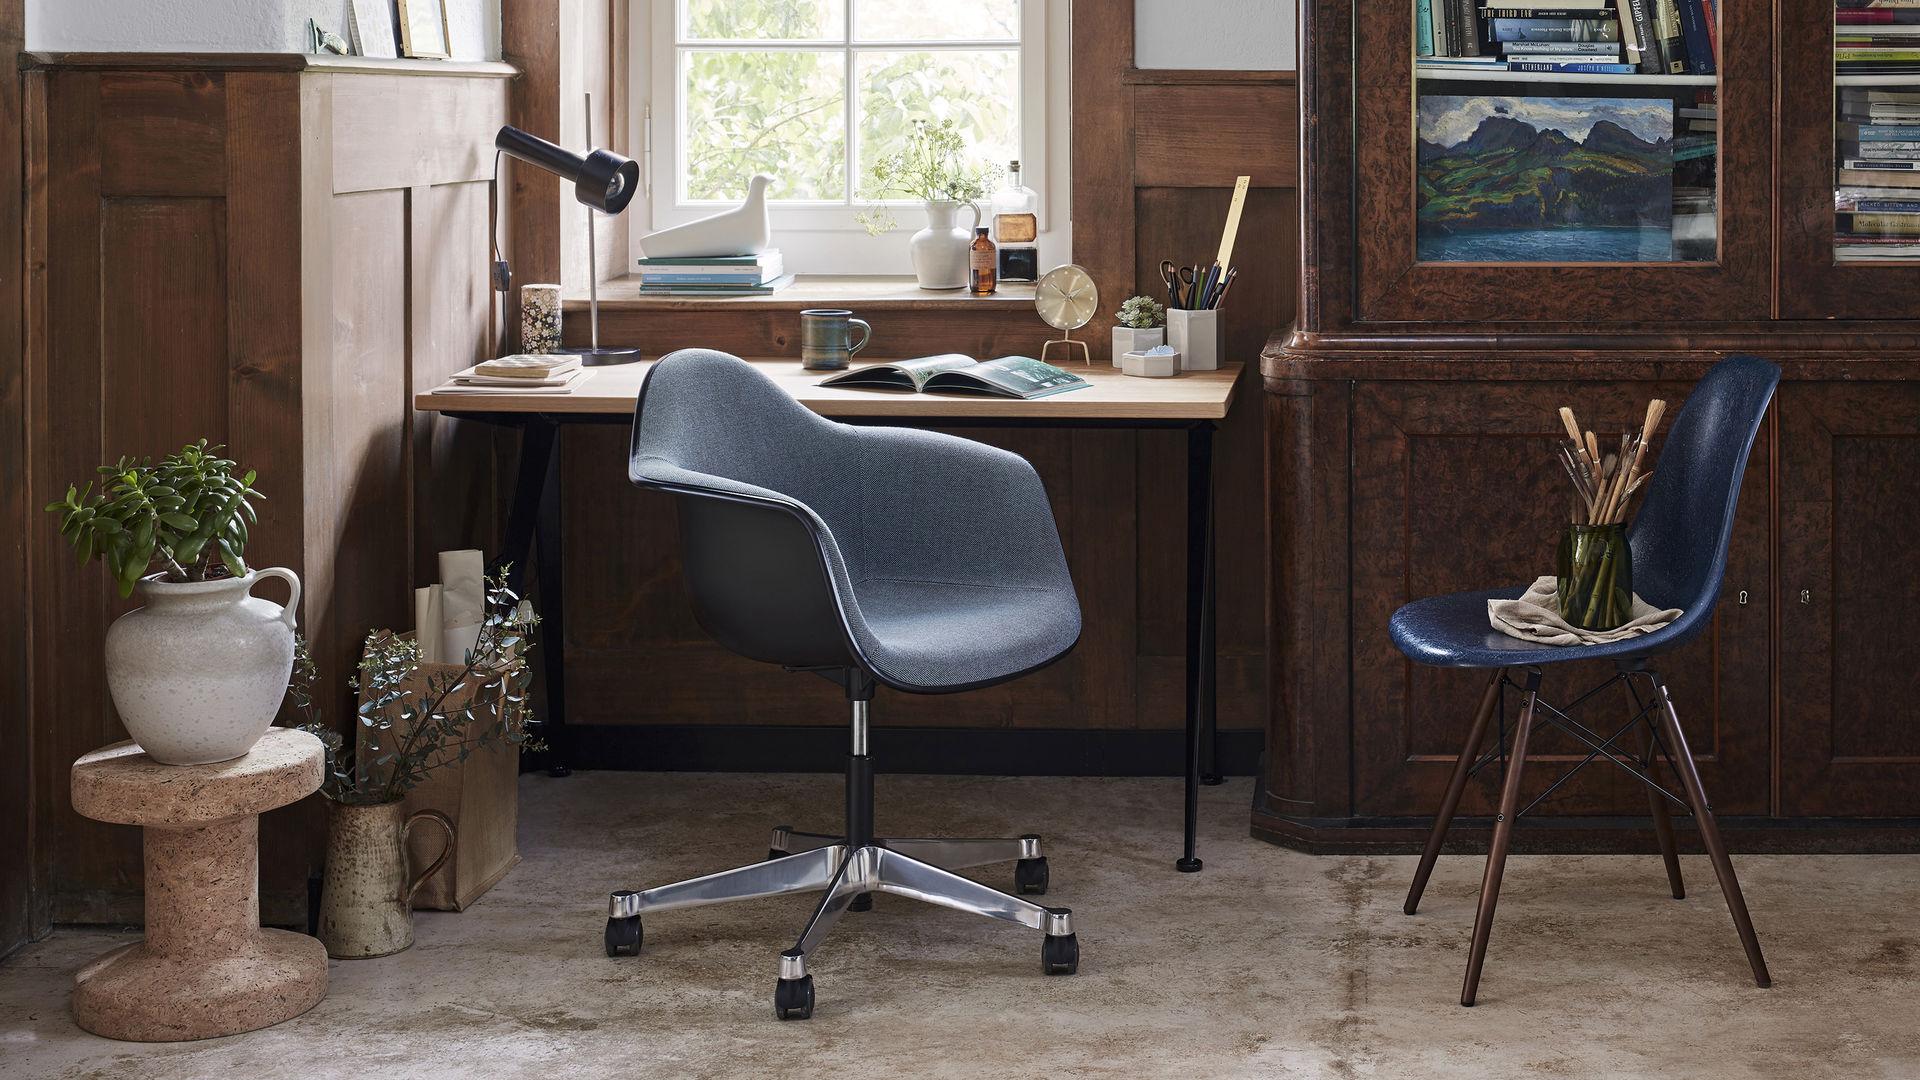 Eames Fiberglass Chair DSW Eames Pivot Armchair PACC Corkstool l'Oiseau_Web_16-9